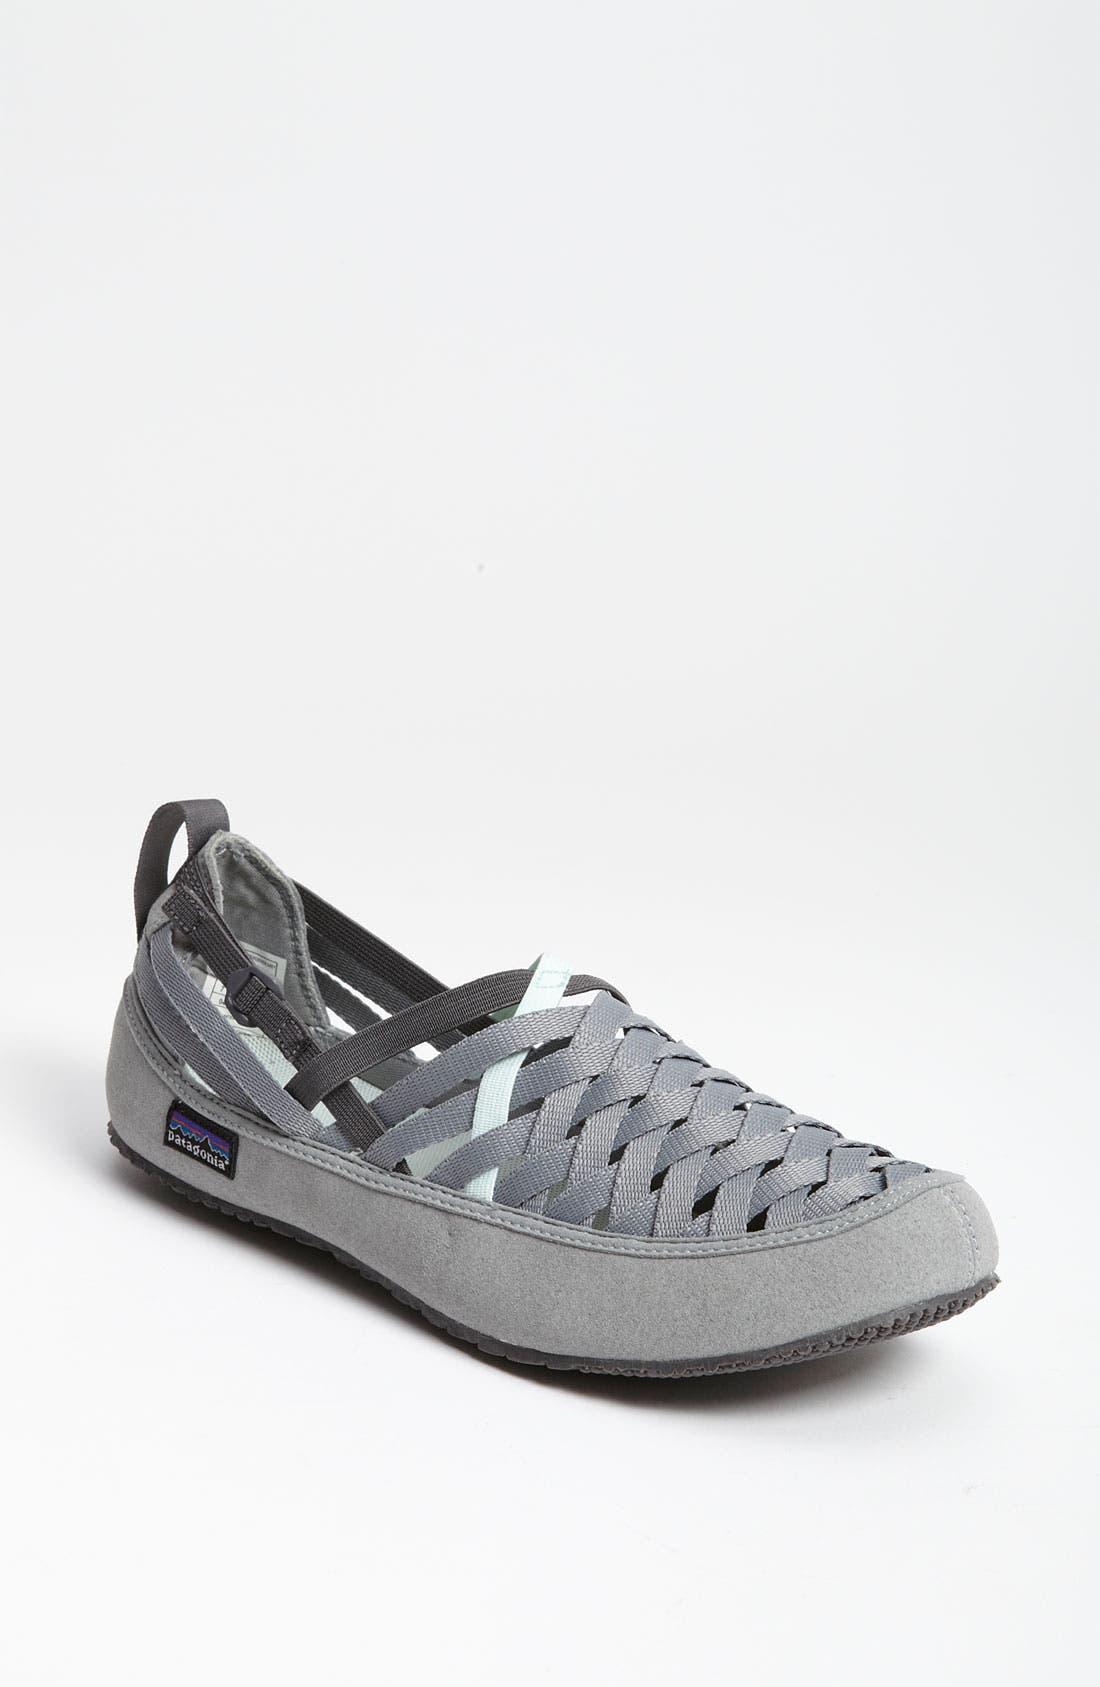 Main Image - Patagonia 'Advocate - Lattice' Sneaker